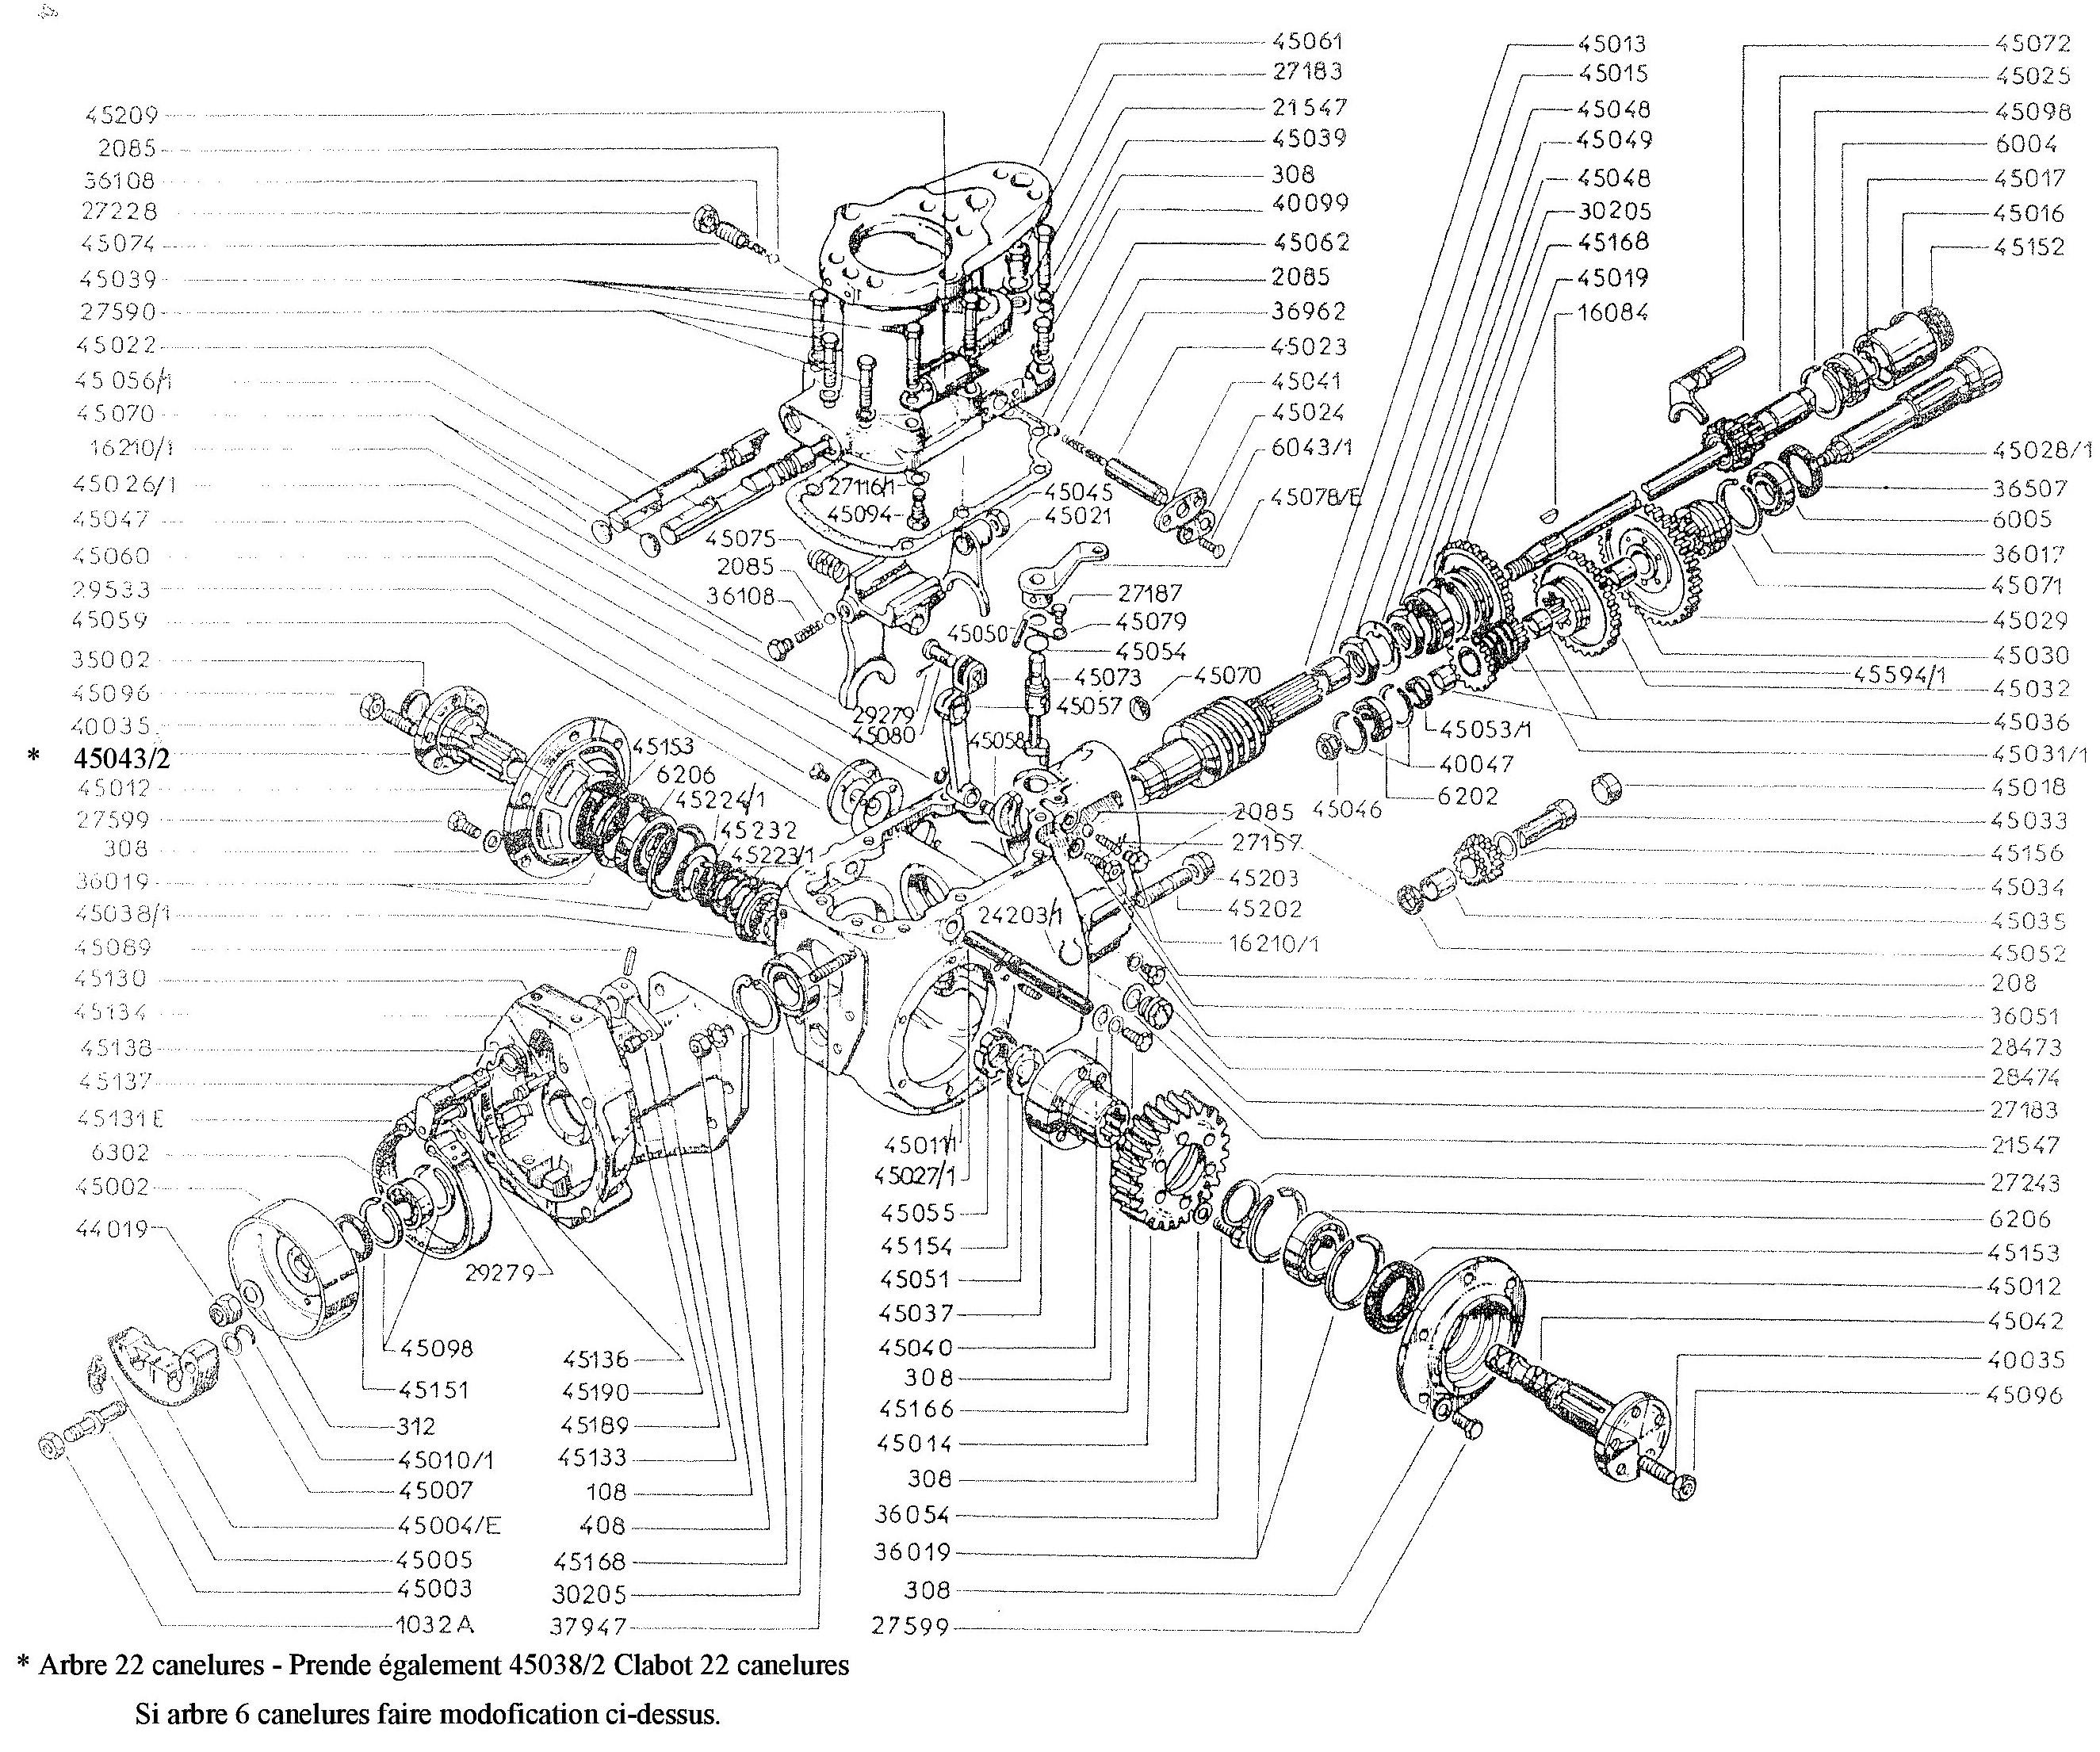 vue eclatee reducteur modele A Staub PPX